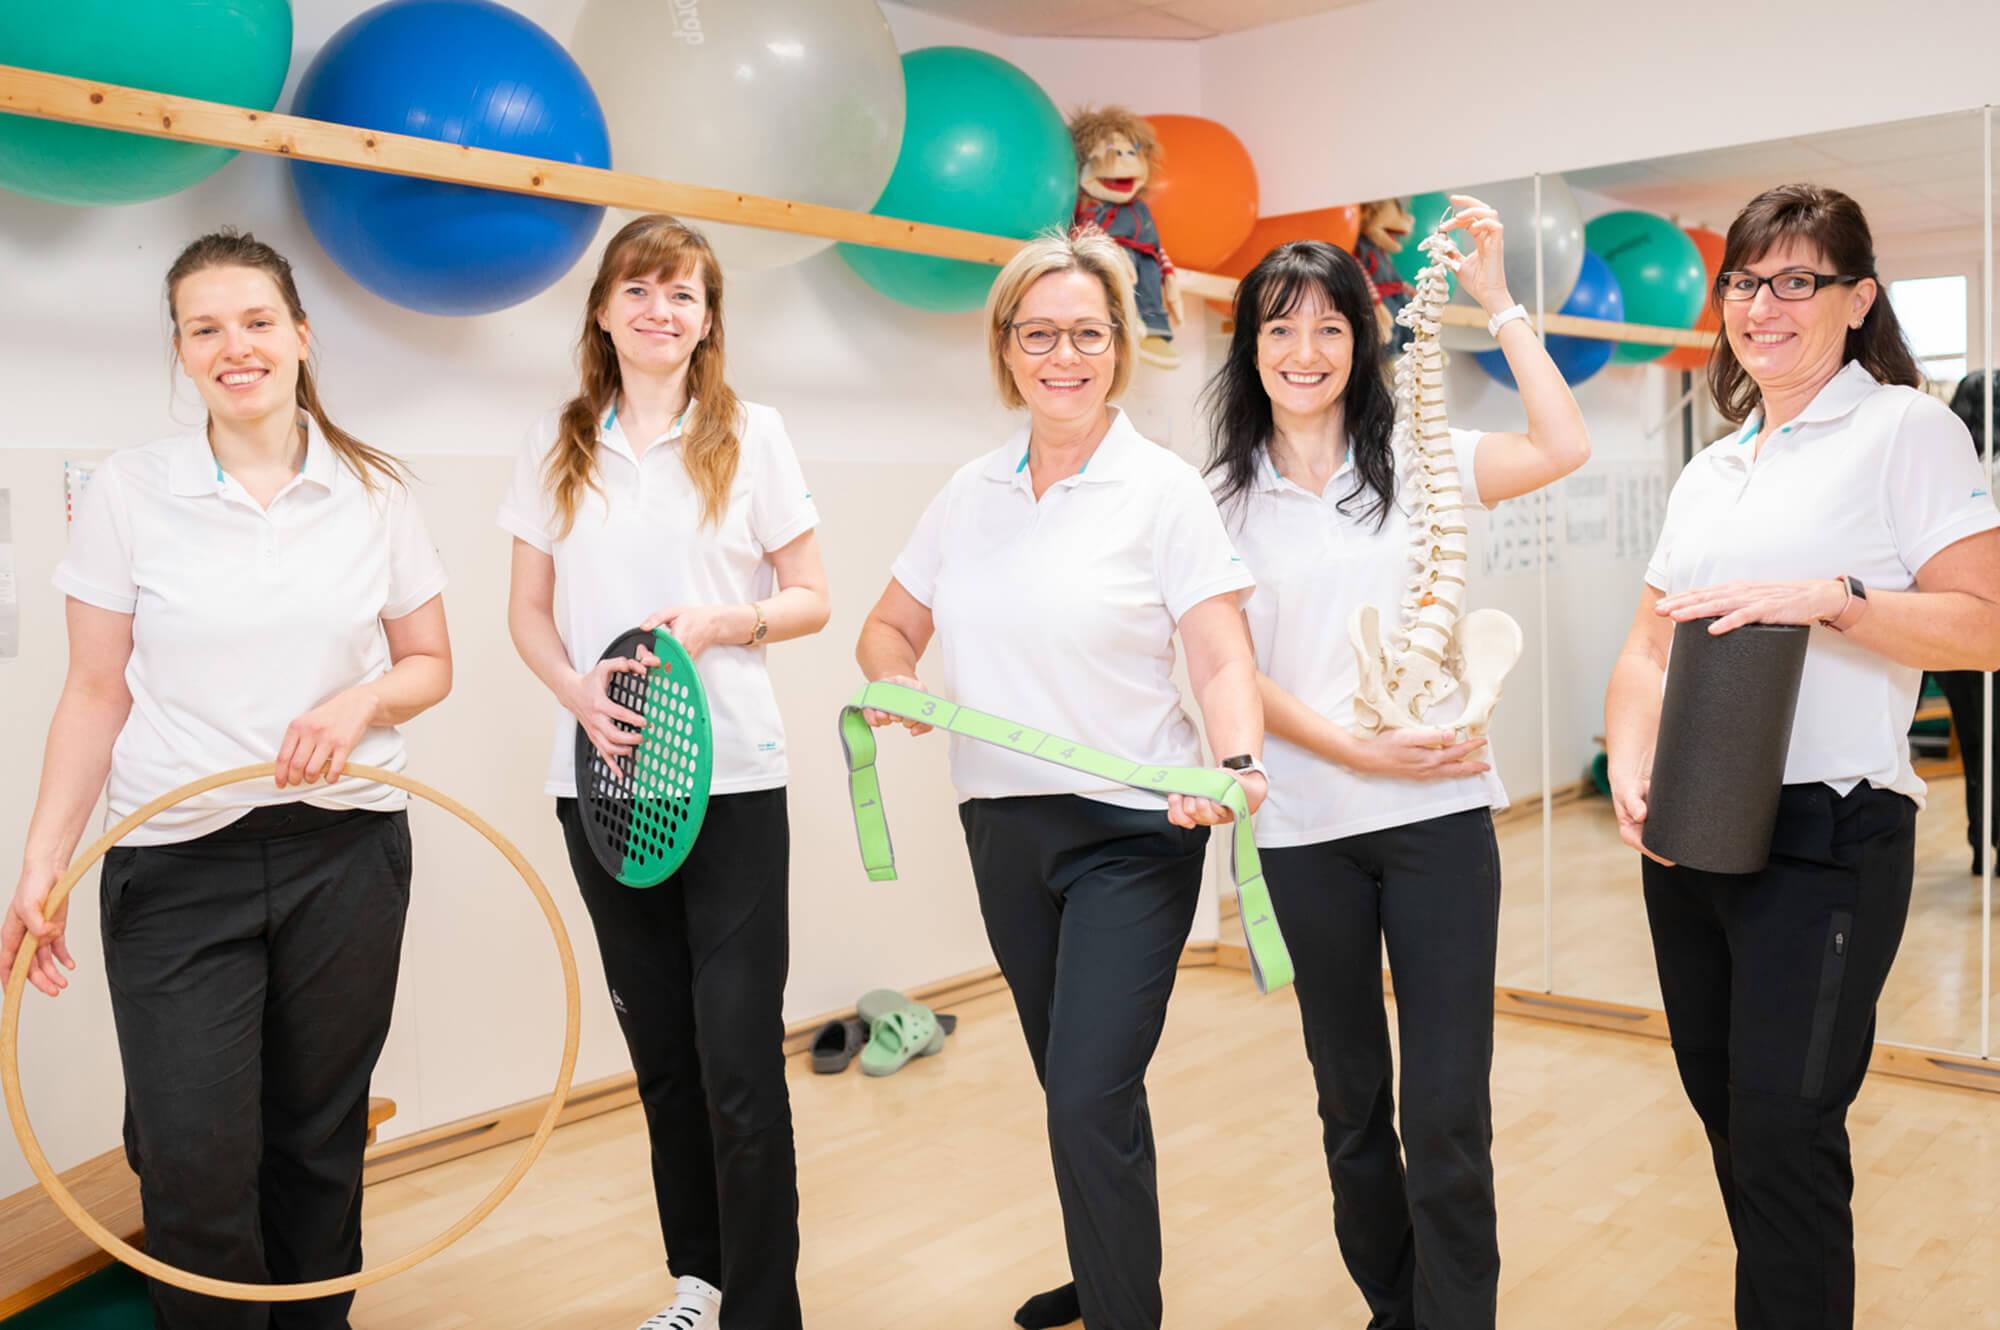 Physiotherapie Praxis Petra Wadewitz mit Team im Fitnessraum